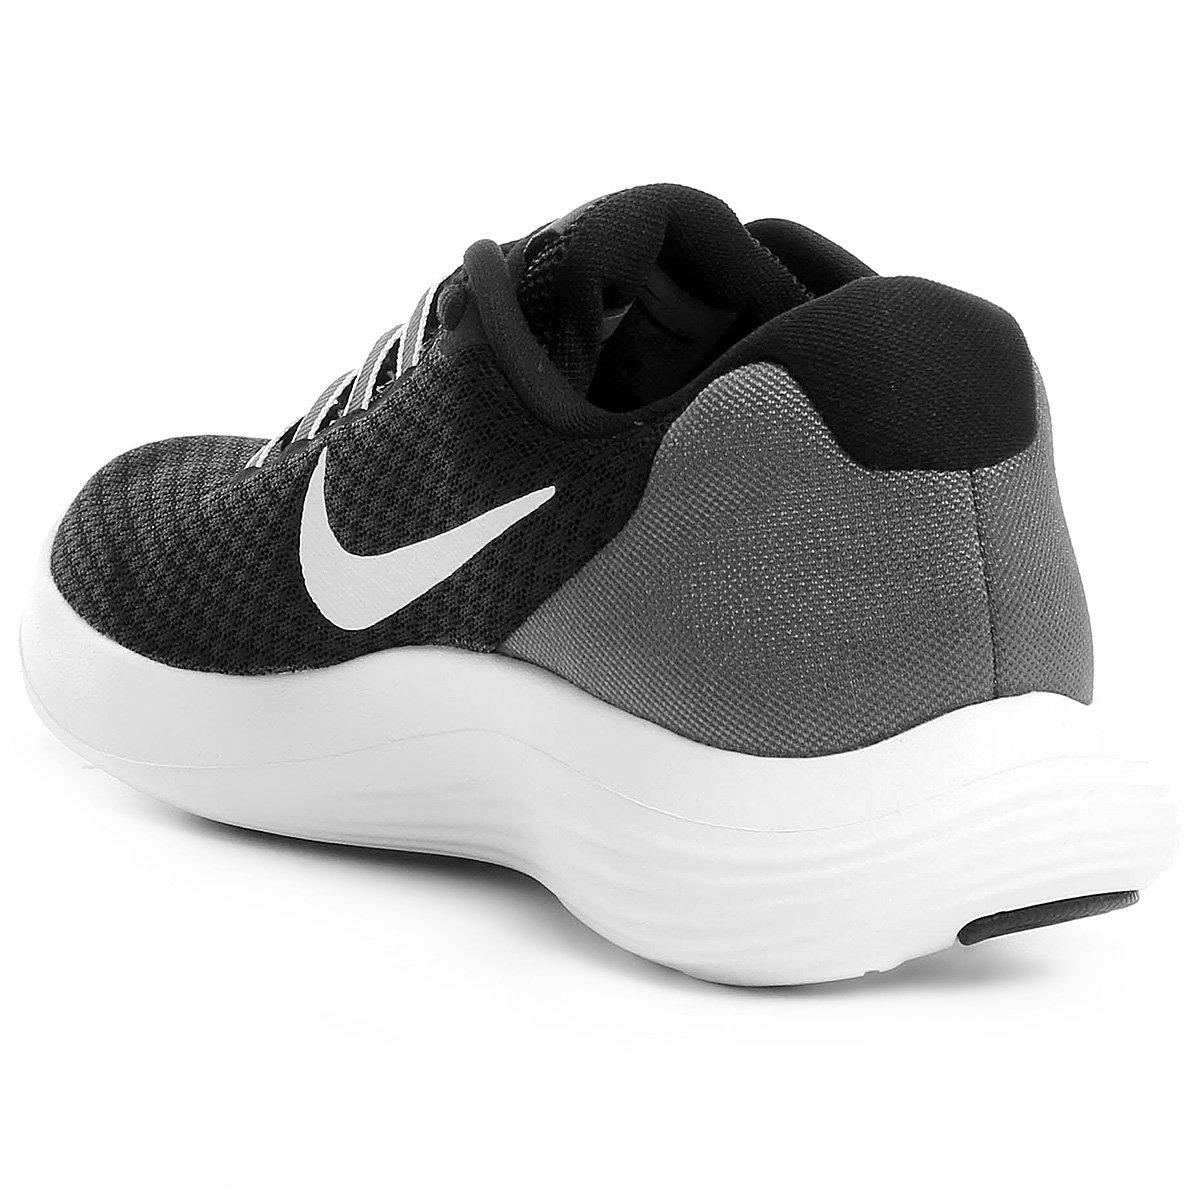 Tênis Nike Lunarconverge Feminino - Compre Agora  68fa617f963ea